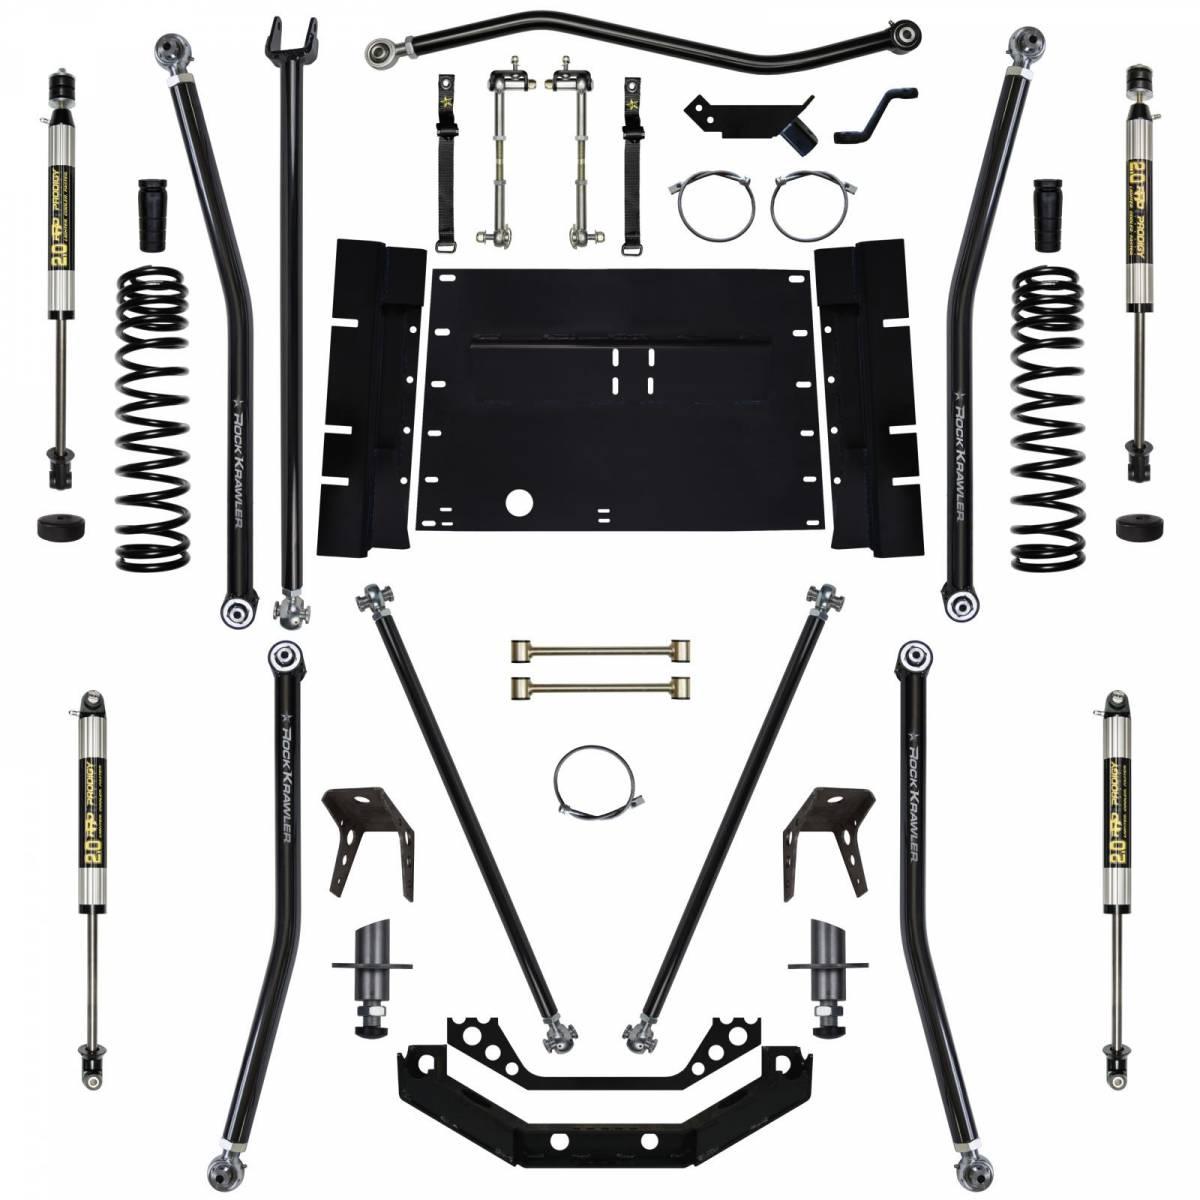 hight resolution of rock krawler suspension 5 5 inch long arm lift kit w shocks 8 inch stretch